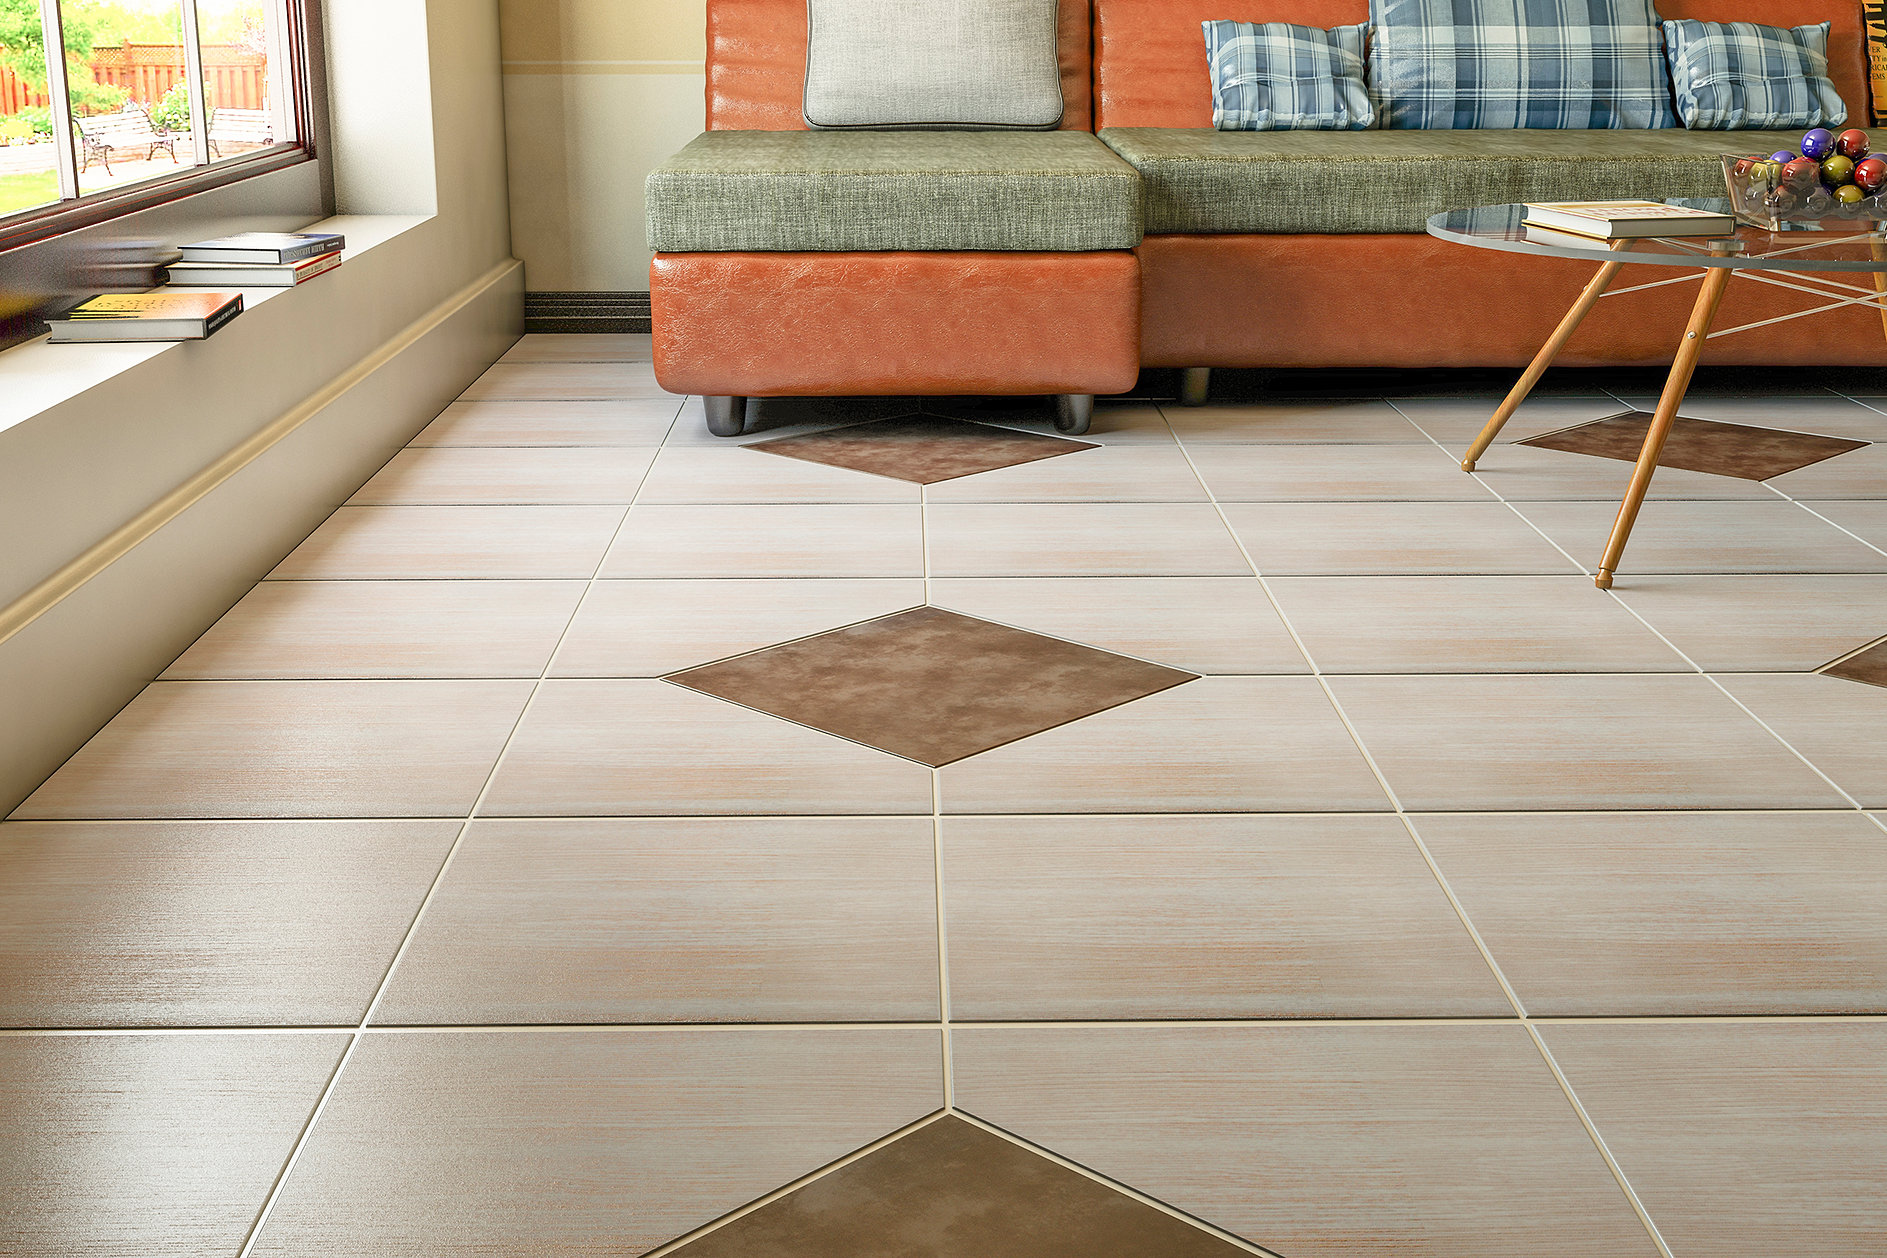 Ceramic Tiles | Ortigas Center | Eurotiles Industrial Corporation